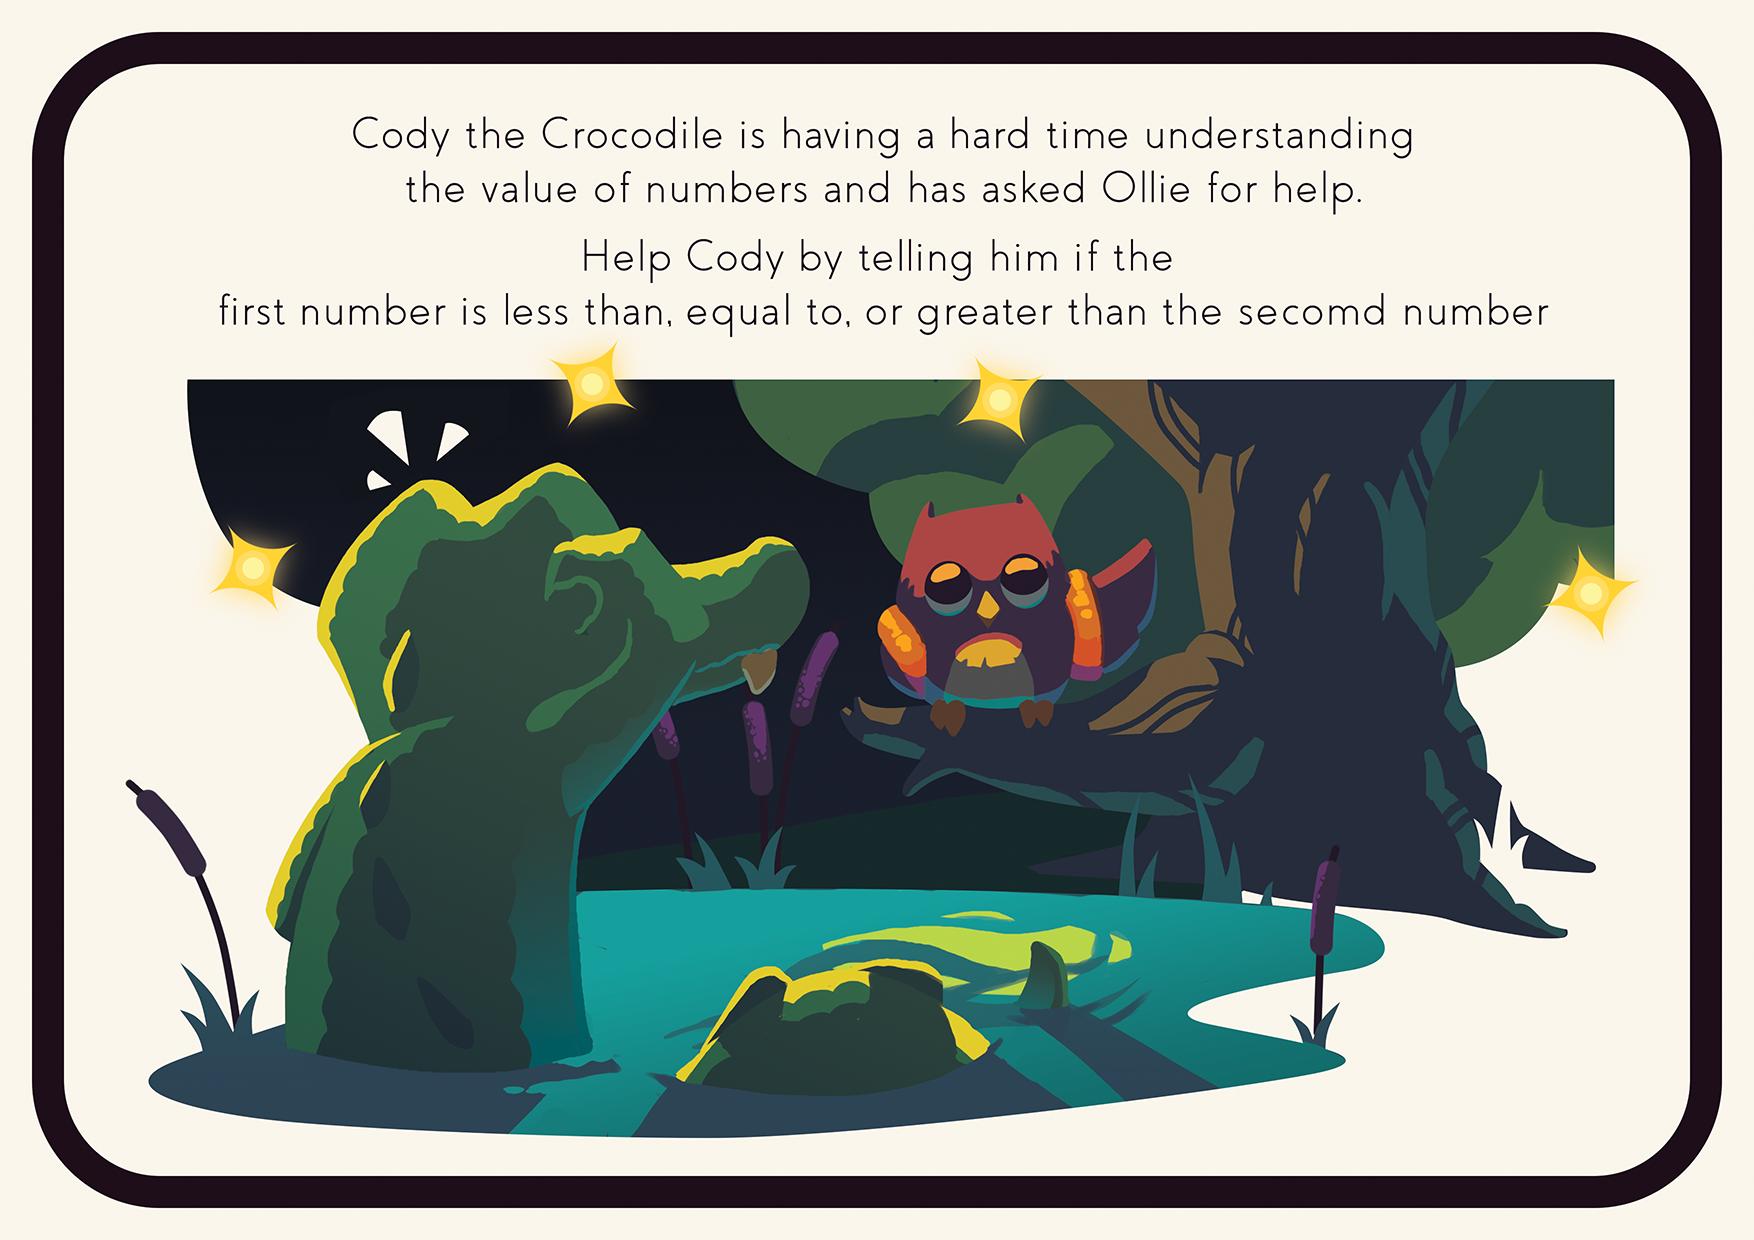 HungryCrocodile_Illustration_Upload.png